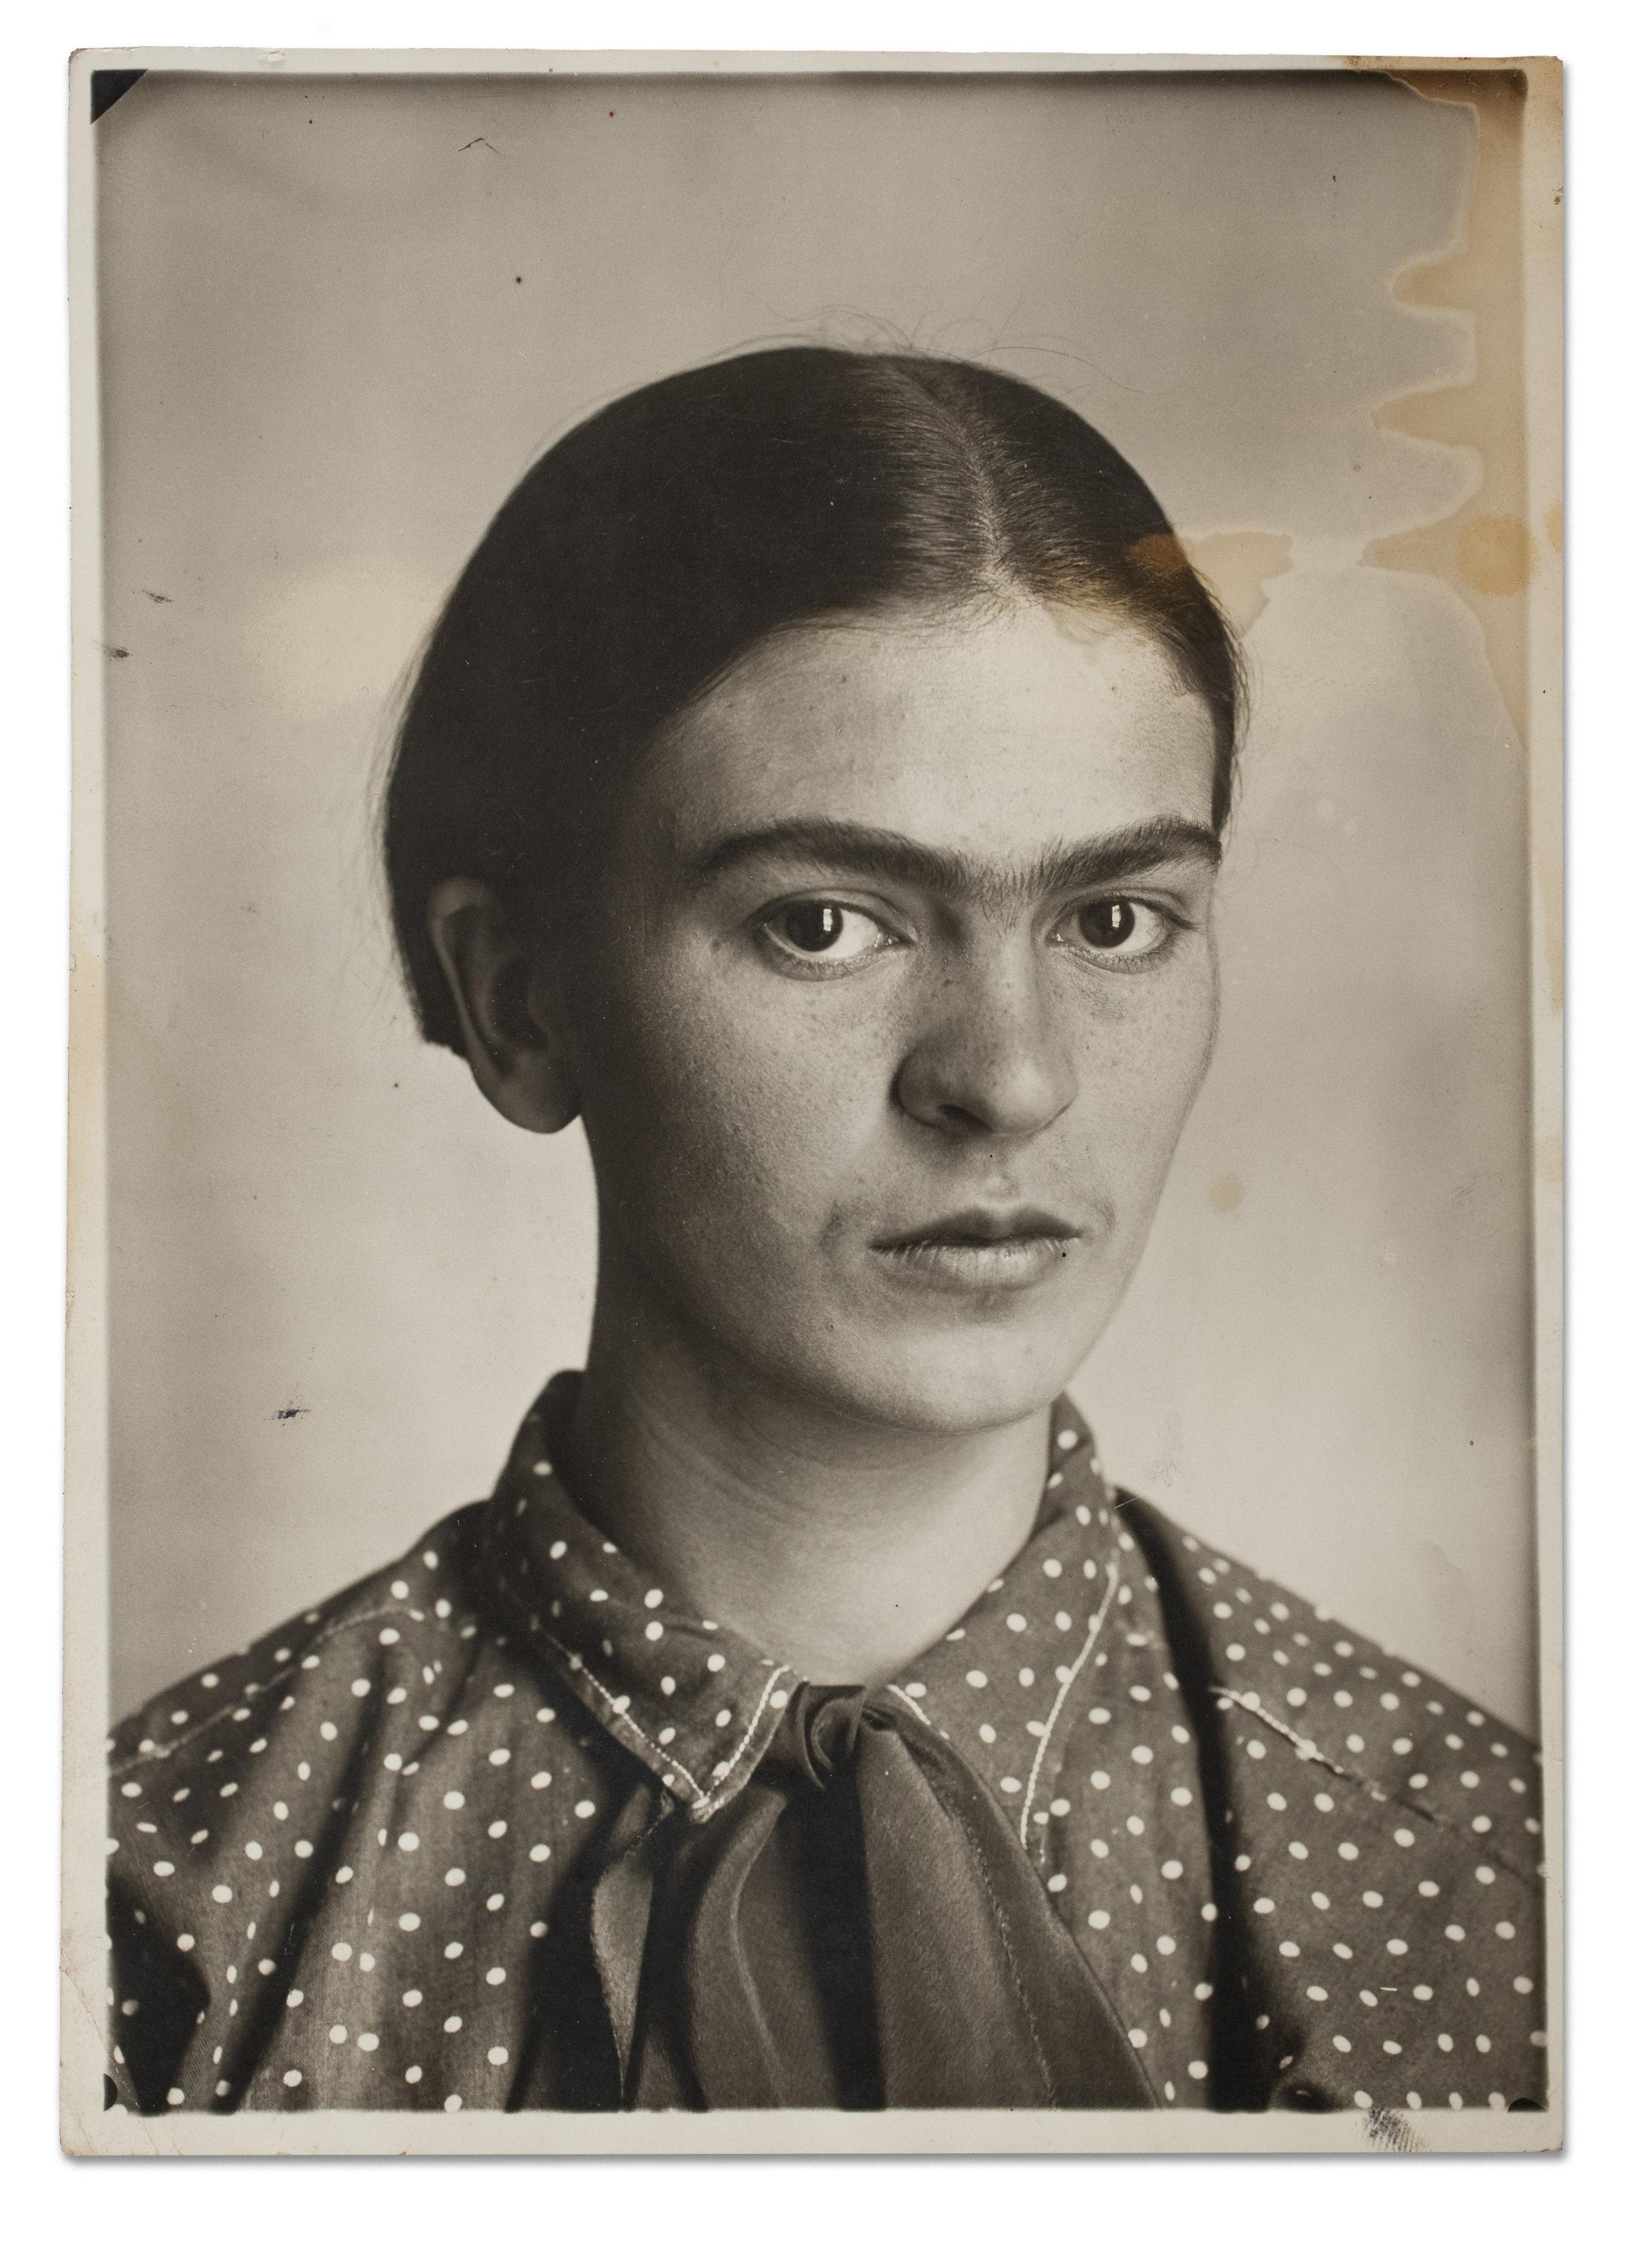 Frida Kahlo, c. 1926. Museo Frida Kahlo. © Diego Riviera and Frida Kahlo Archives, Banco de México, Fiduciary of the Trust of the Diego Riviera and Frida Kahlo Museums..jpg